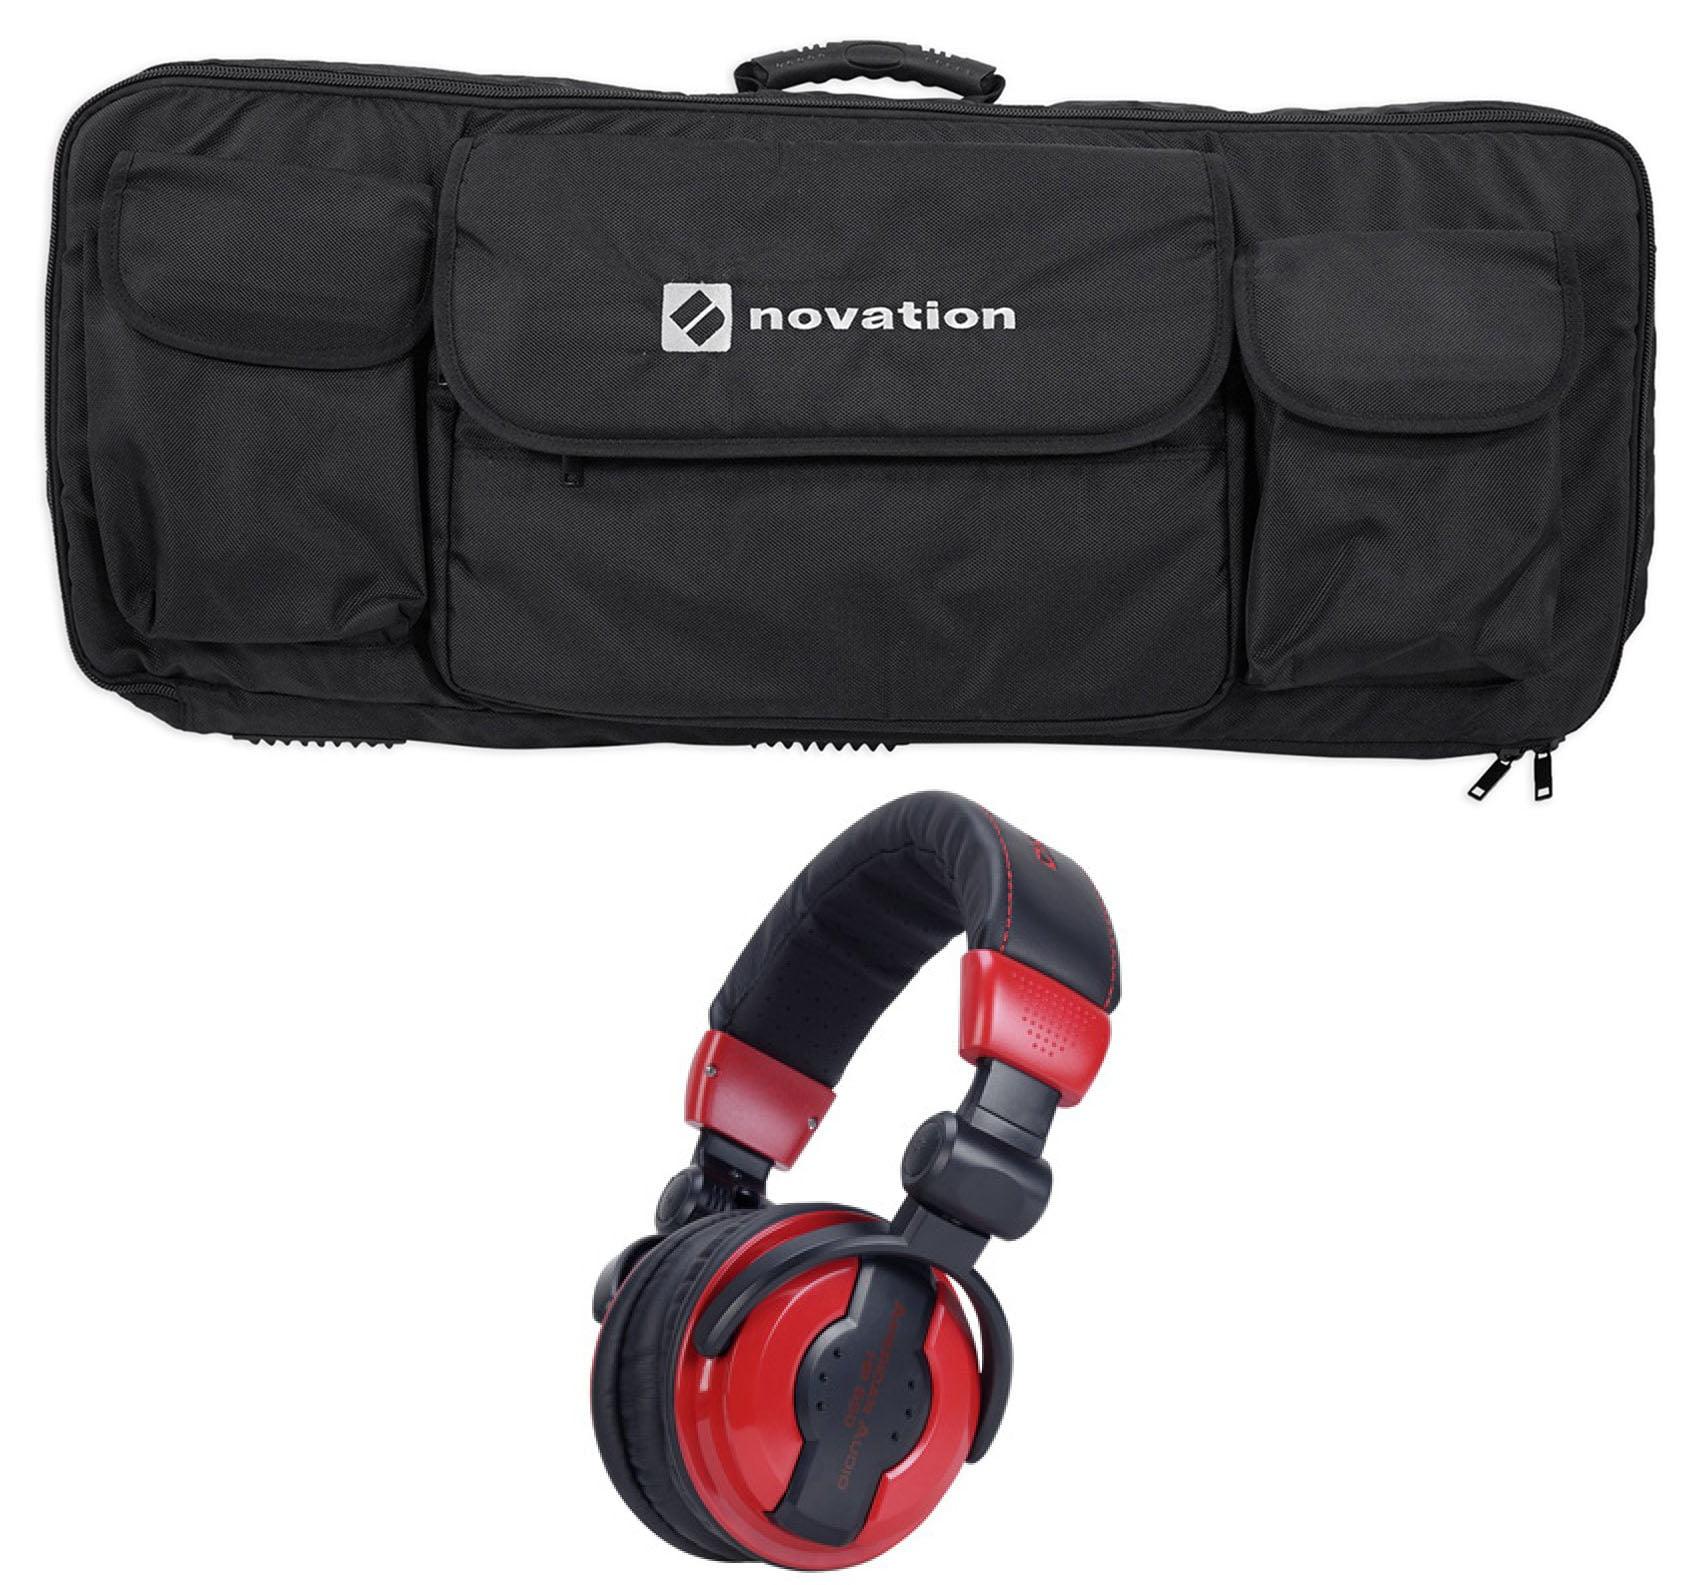 Novation 49-Key Case Soft Carry Bag For Launchkey 49 MIDI Controller+Headphones by Novation